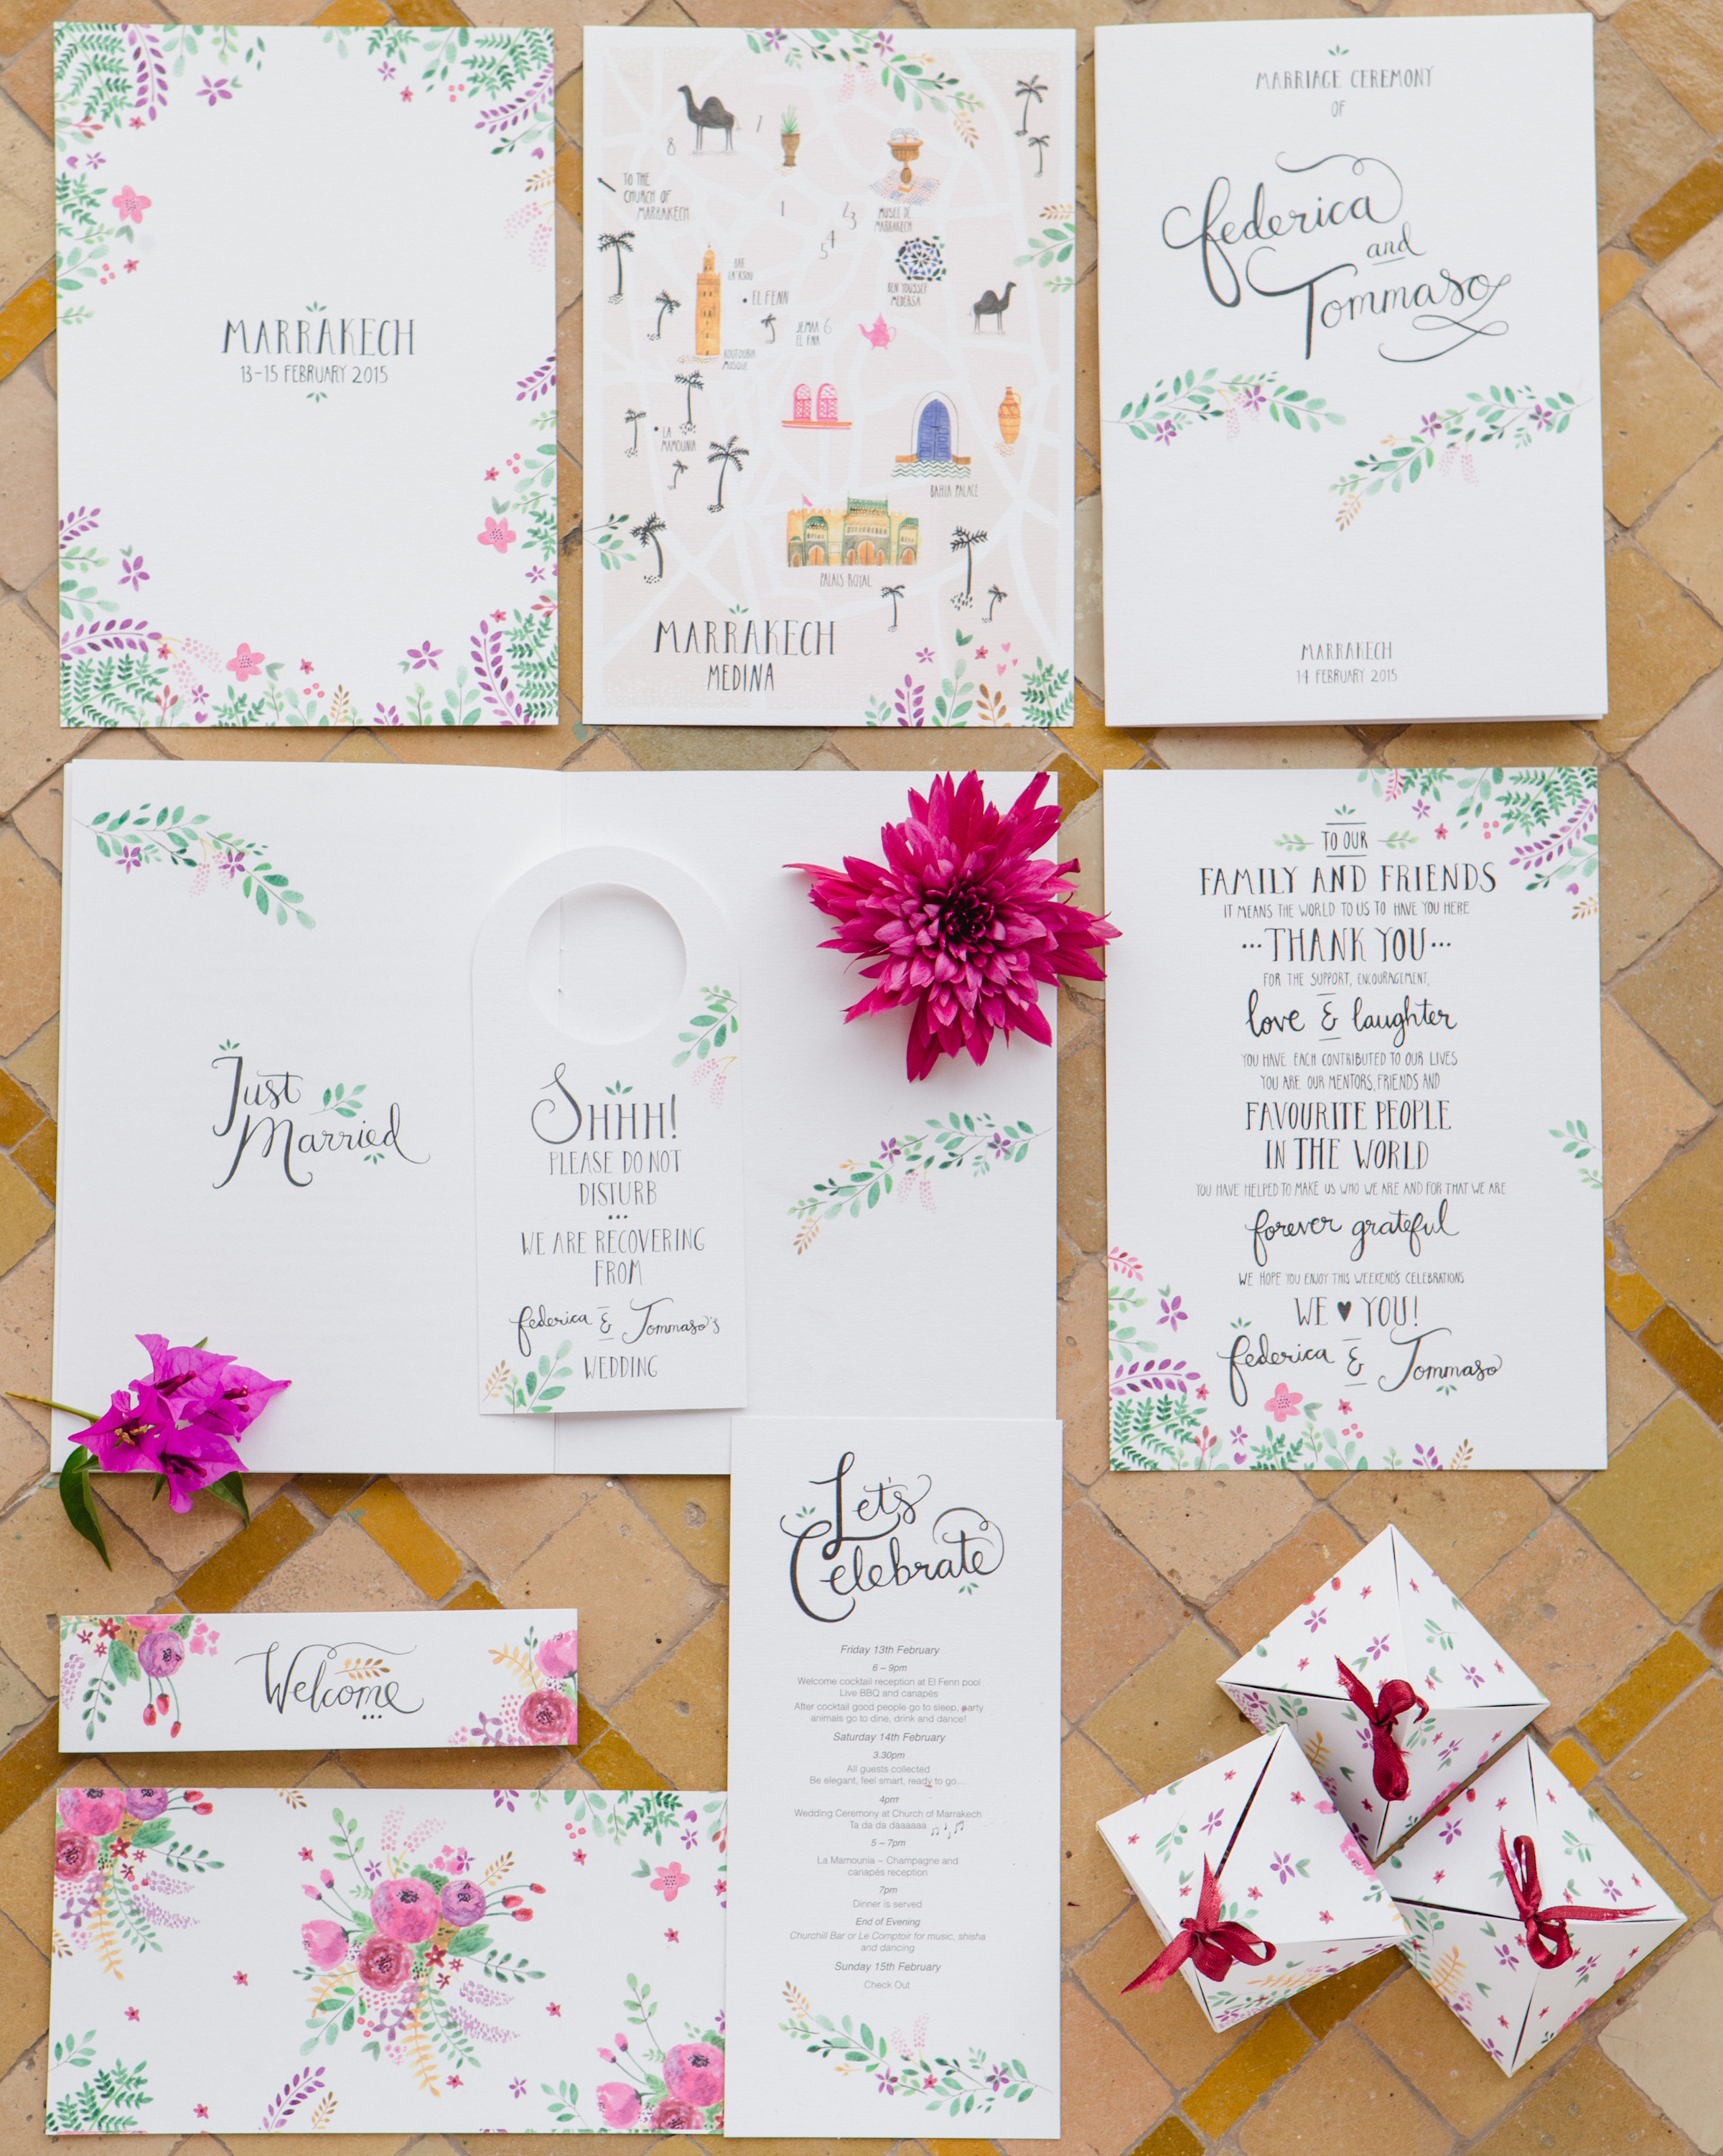 federica-tommaso-wedding-invite-031-s112330-1015.jpg